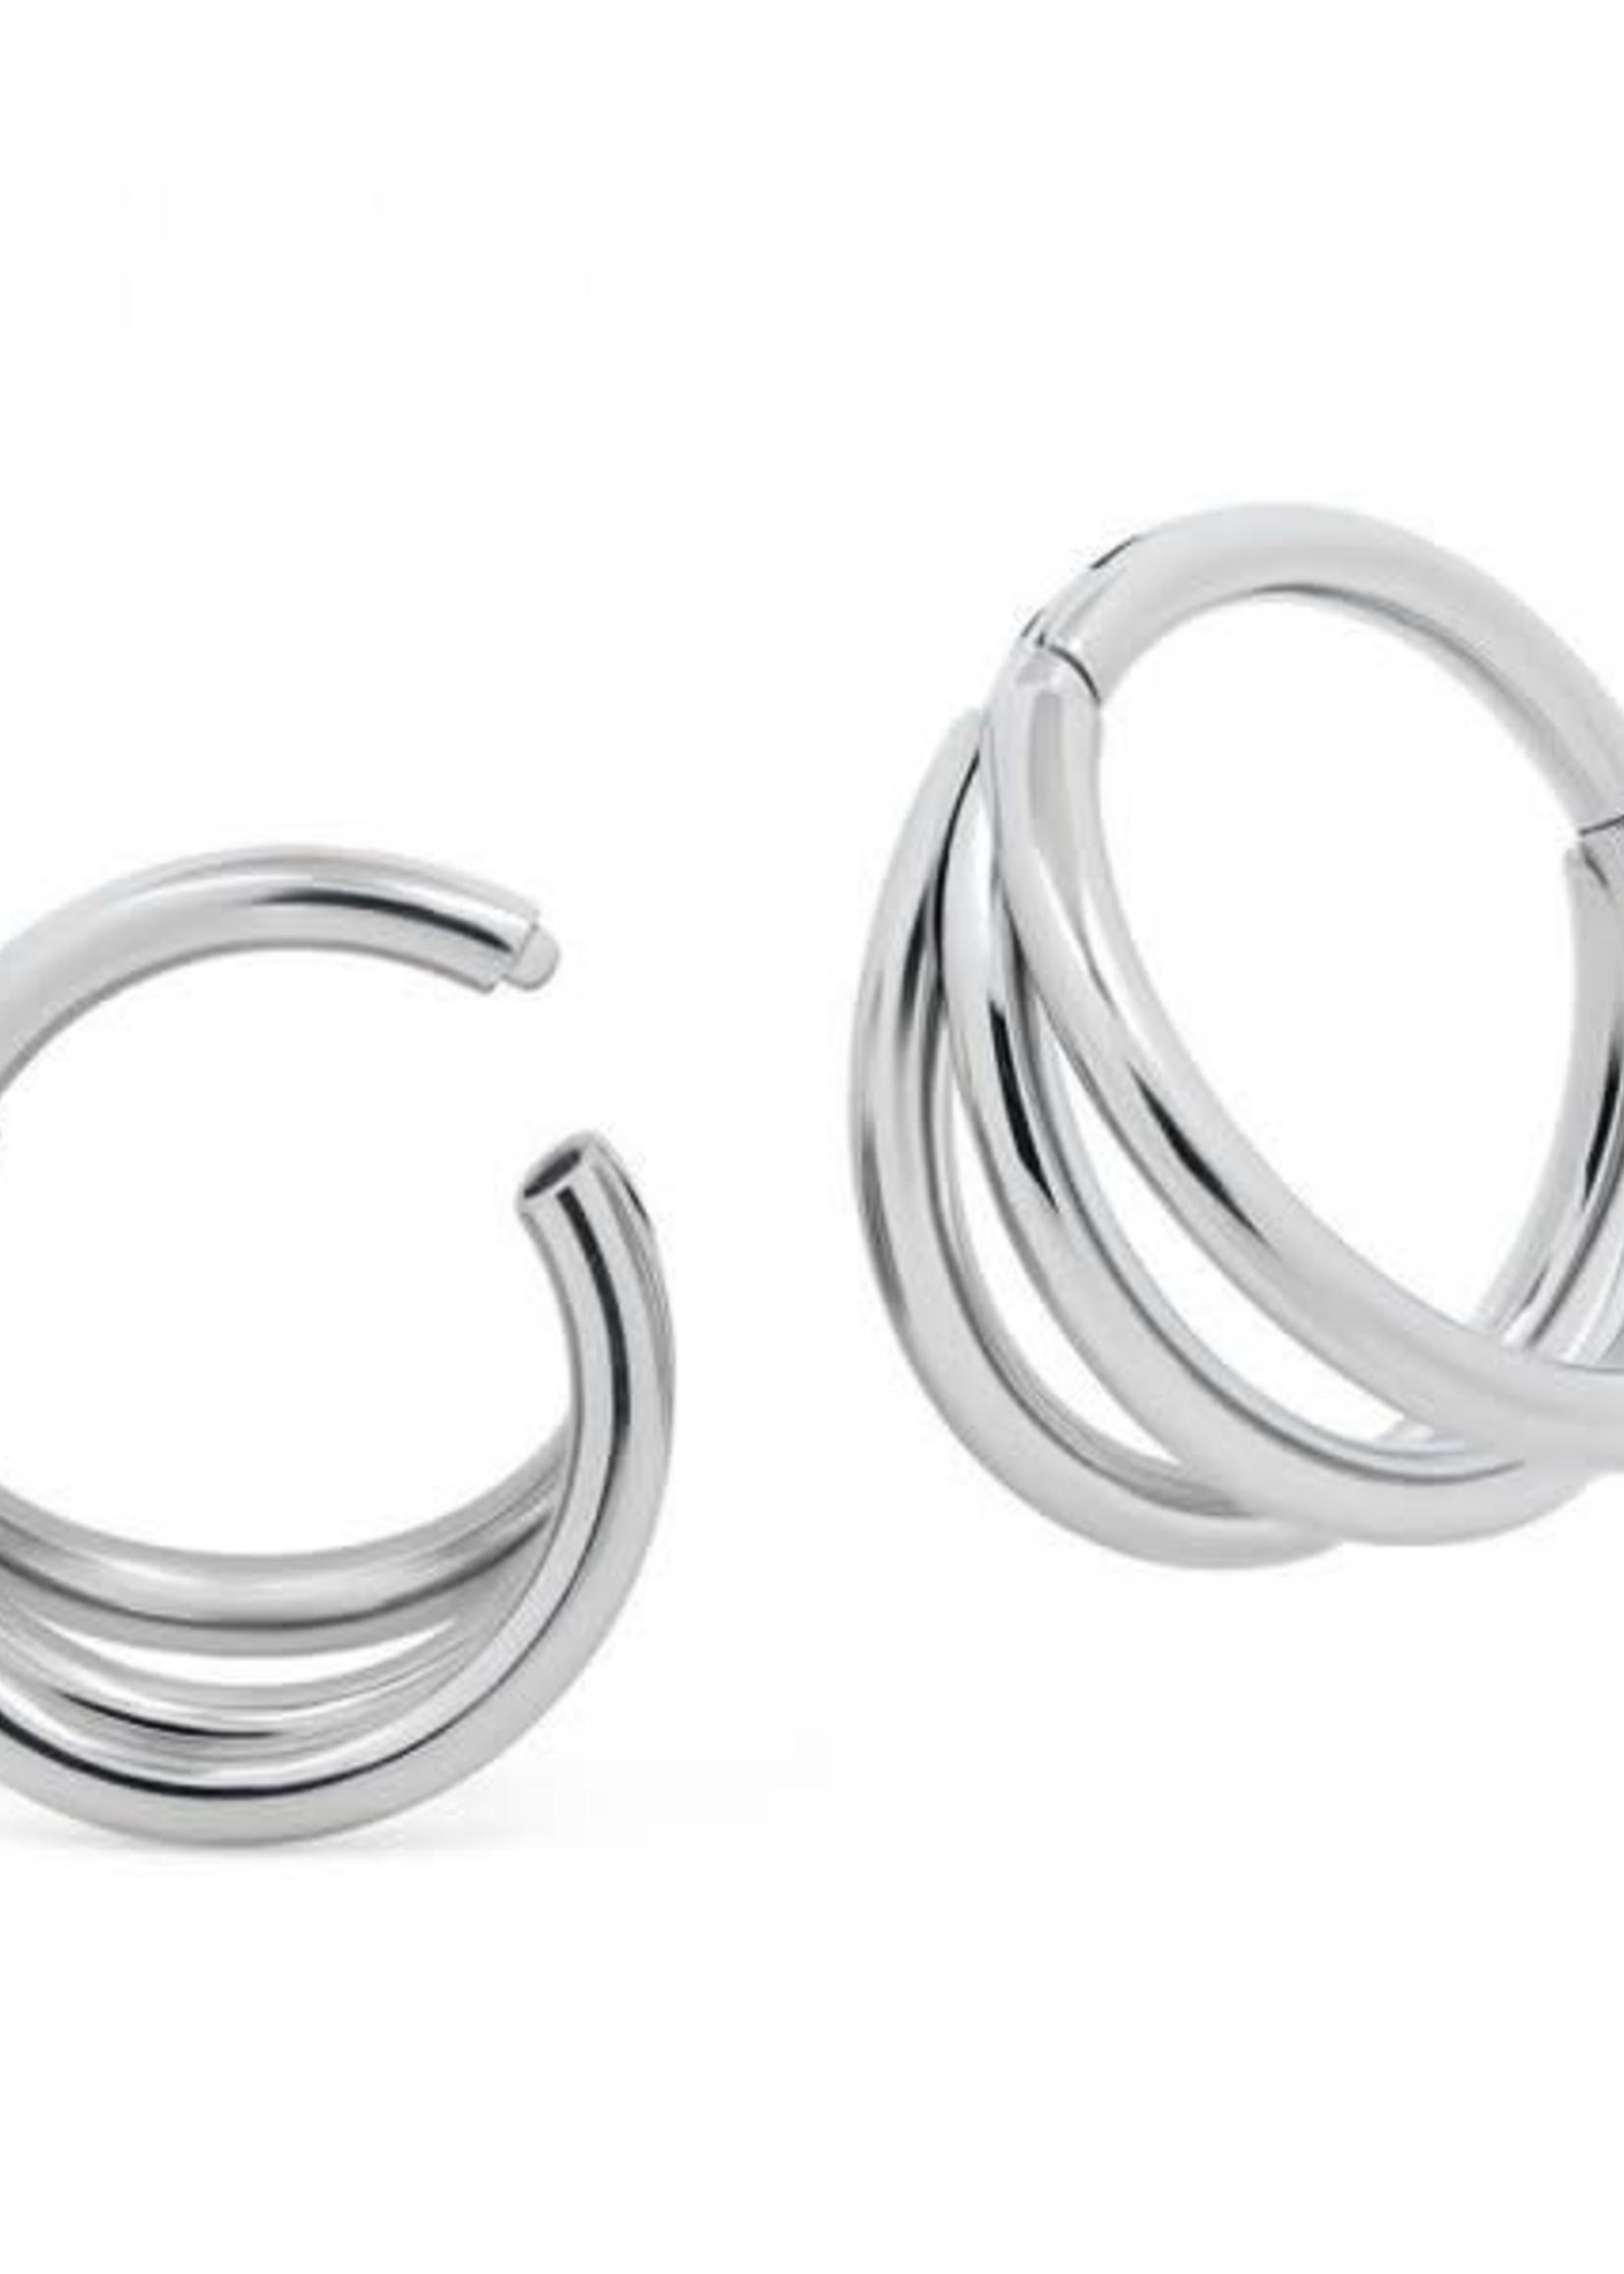 "16g 5/16"" Titanium 3-Ring Trix Hinged Ring"